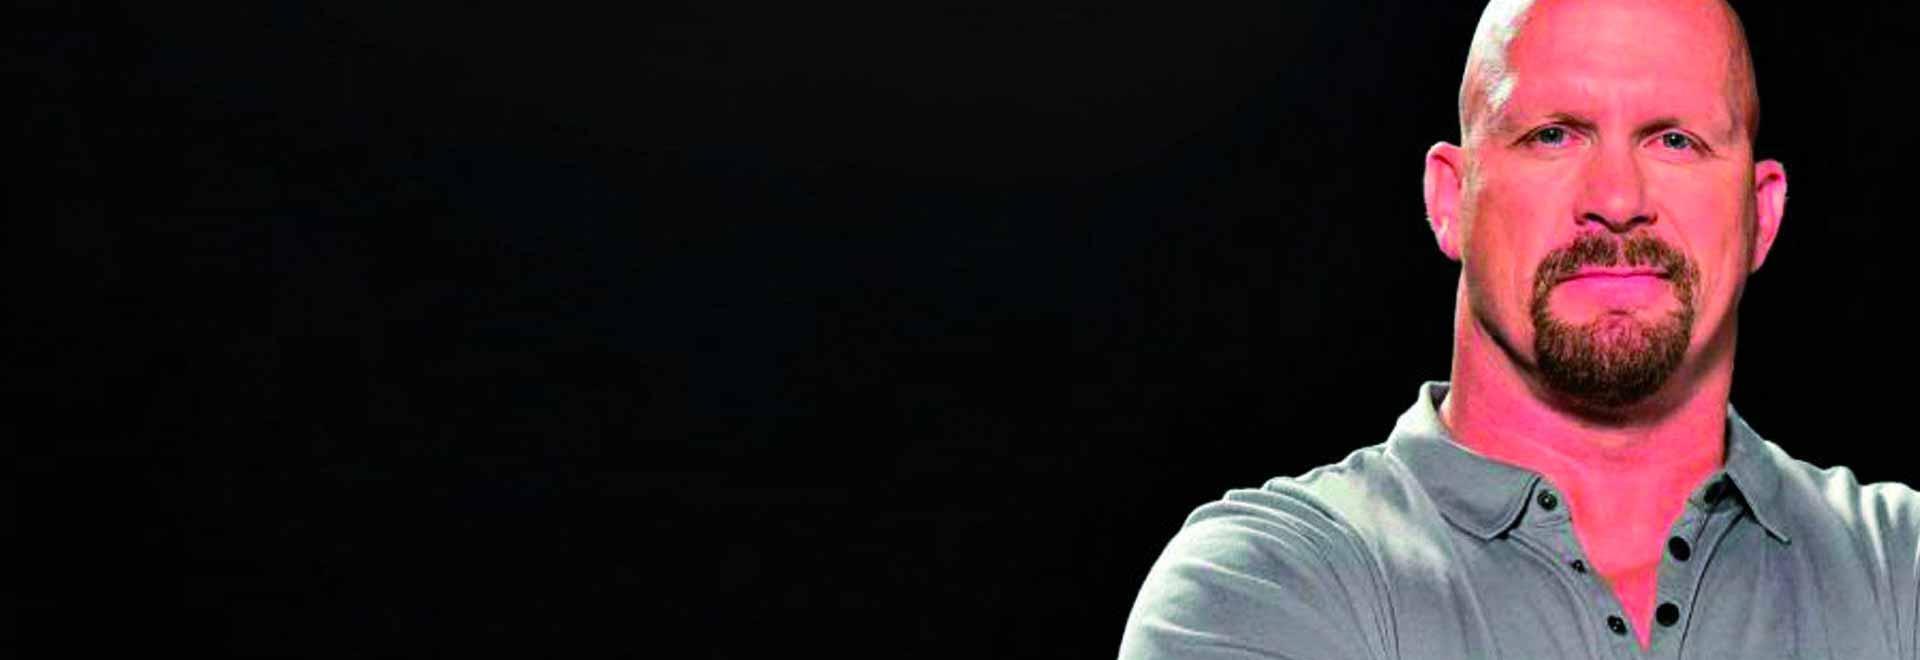 Steve Austin - Sfida implacabile